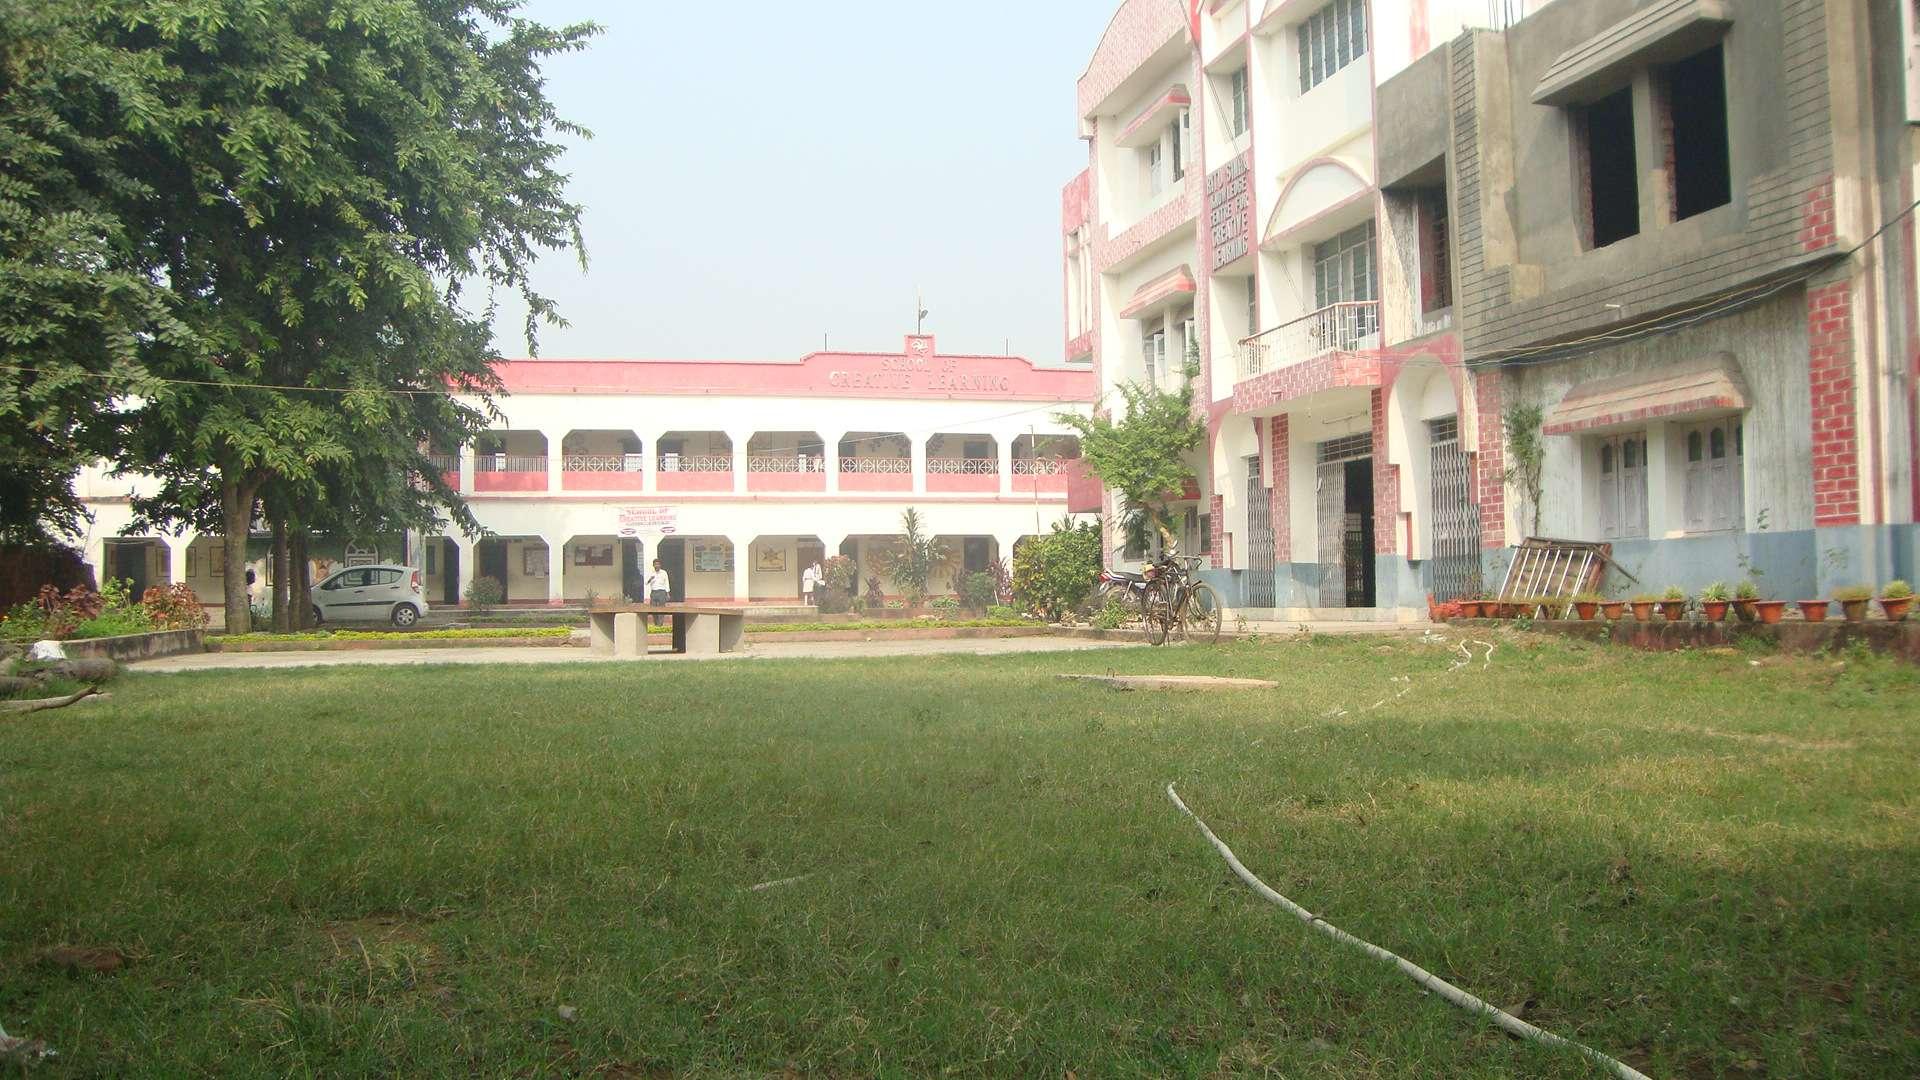 SCHOOL OF CREATIVE LEARNING AT amp PO NARGADA VIA DANAPUR CANTT PATNA BIHAR 330152